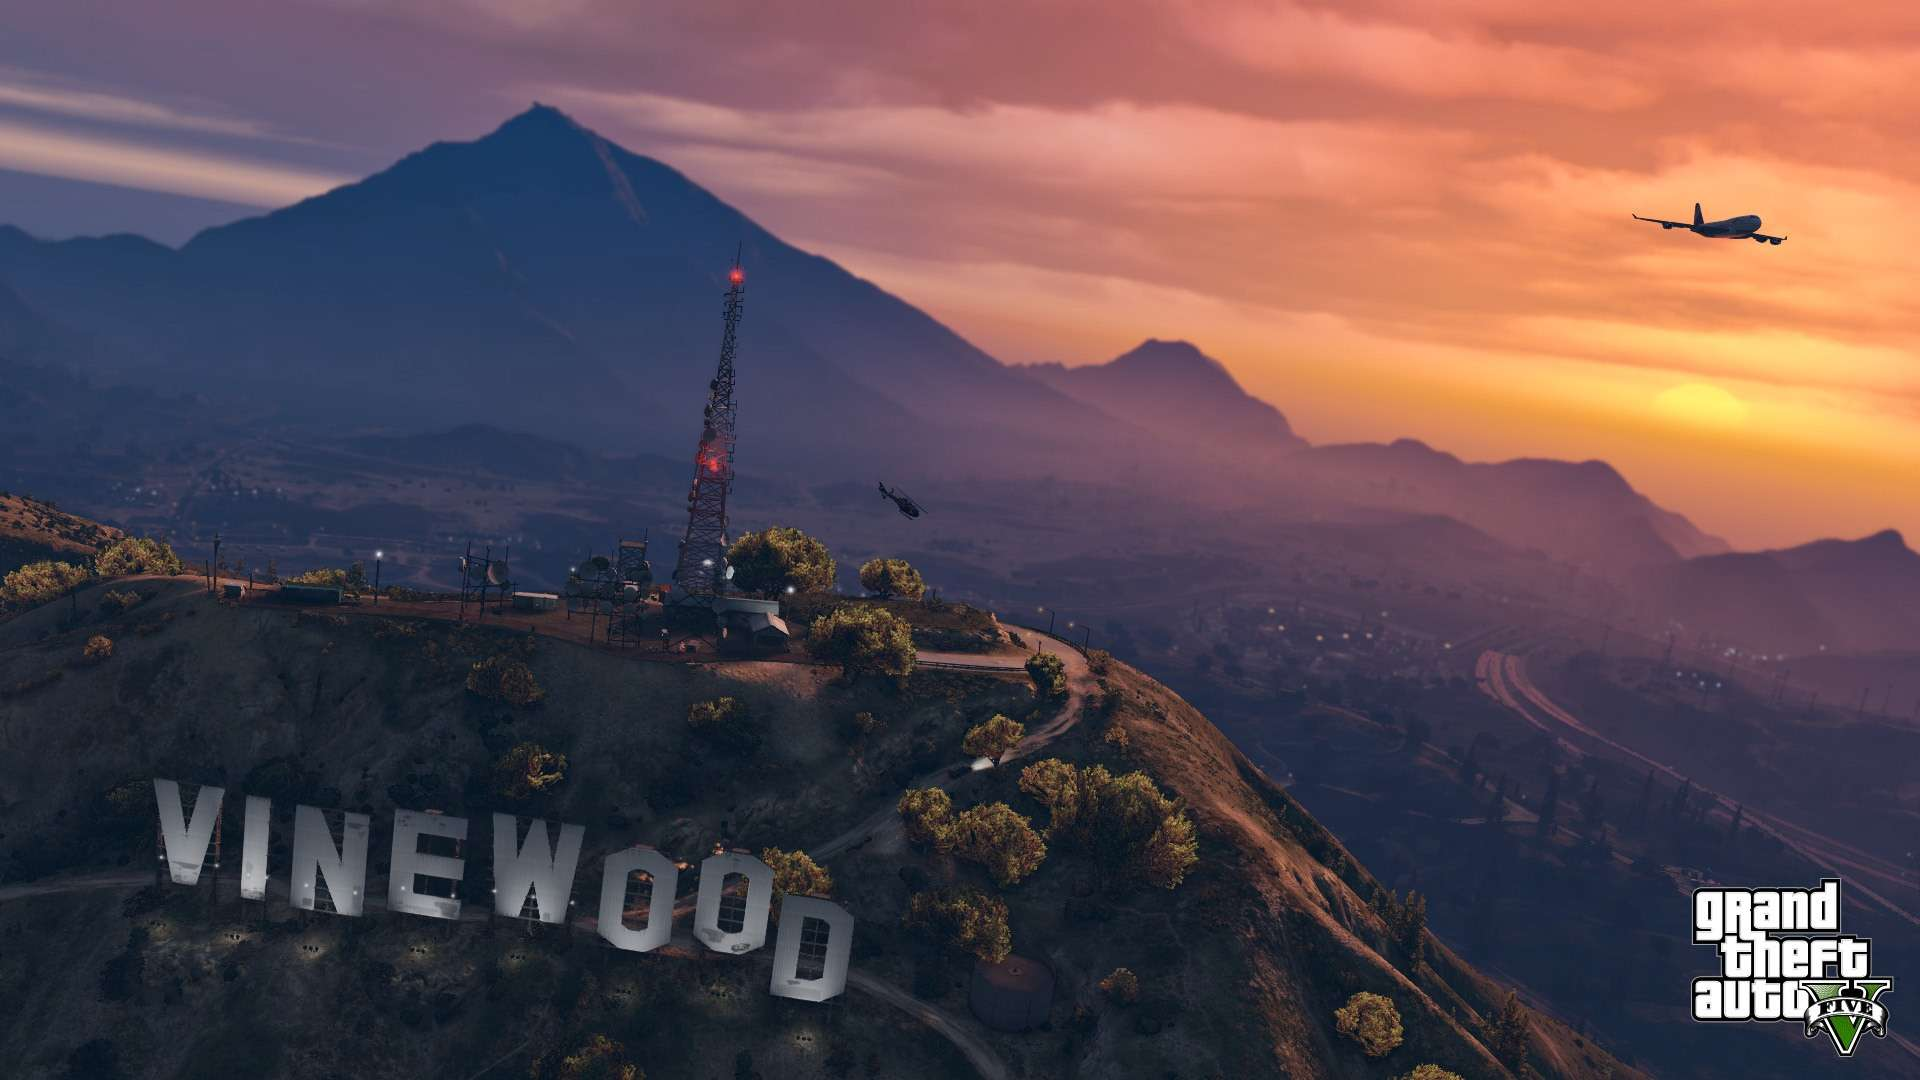 Game Grand Theft Auto V Wallpaper 052